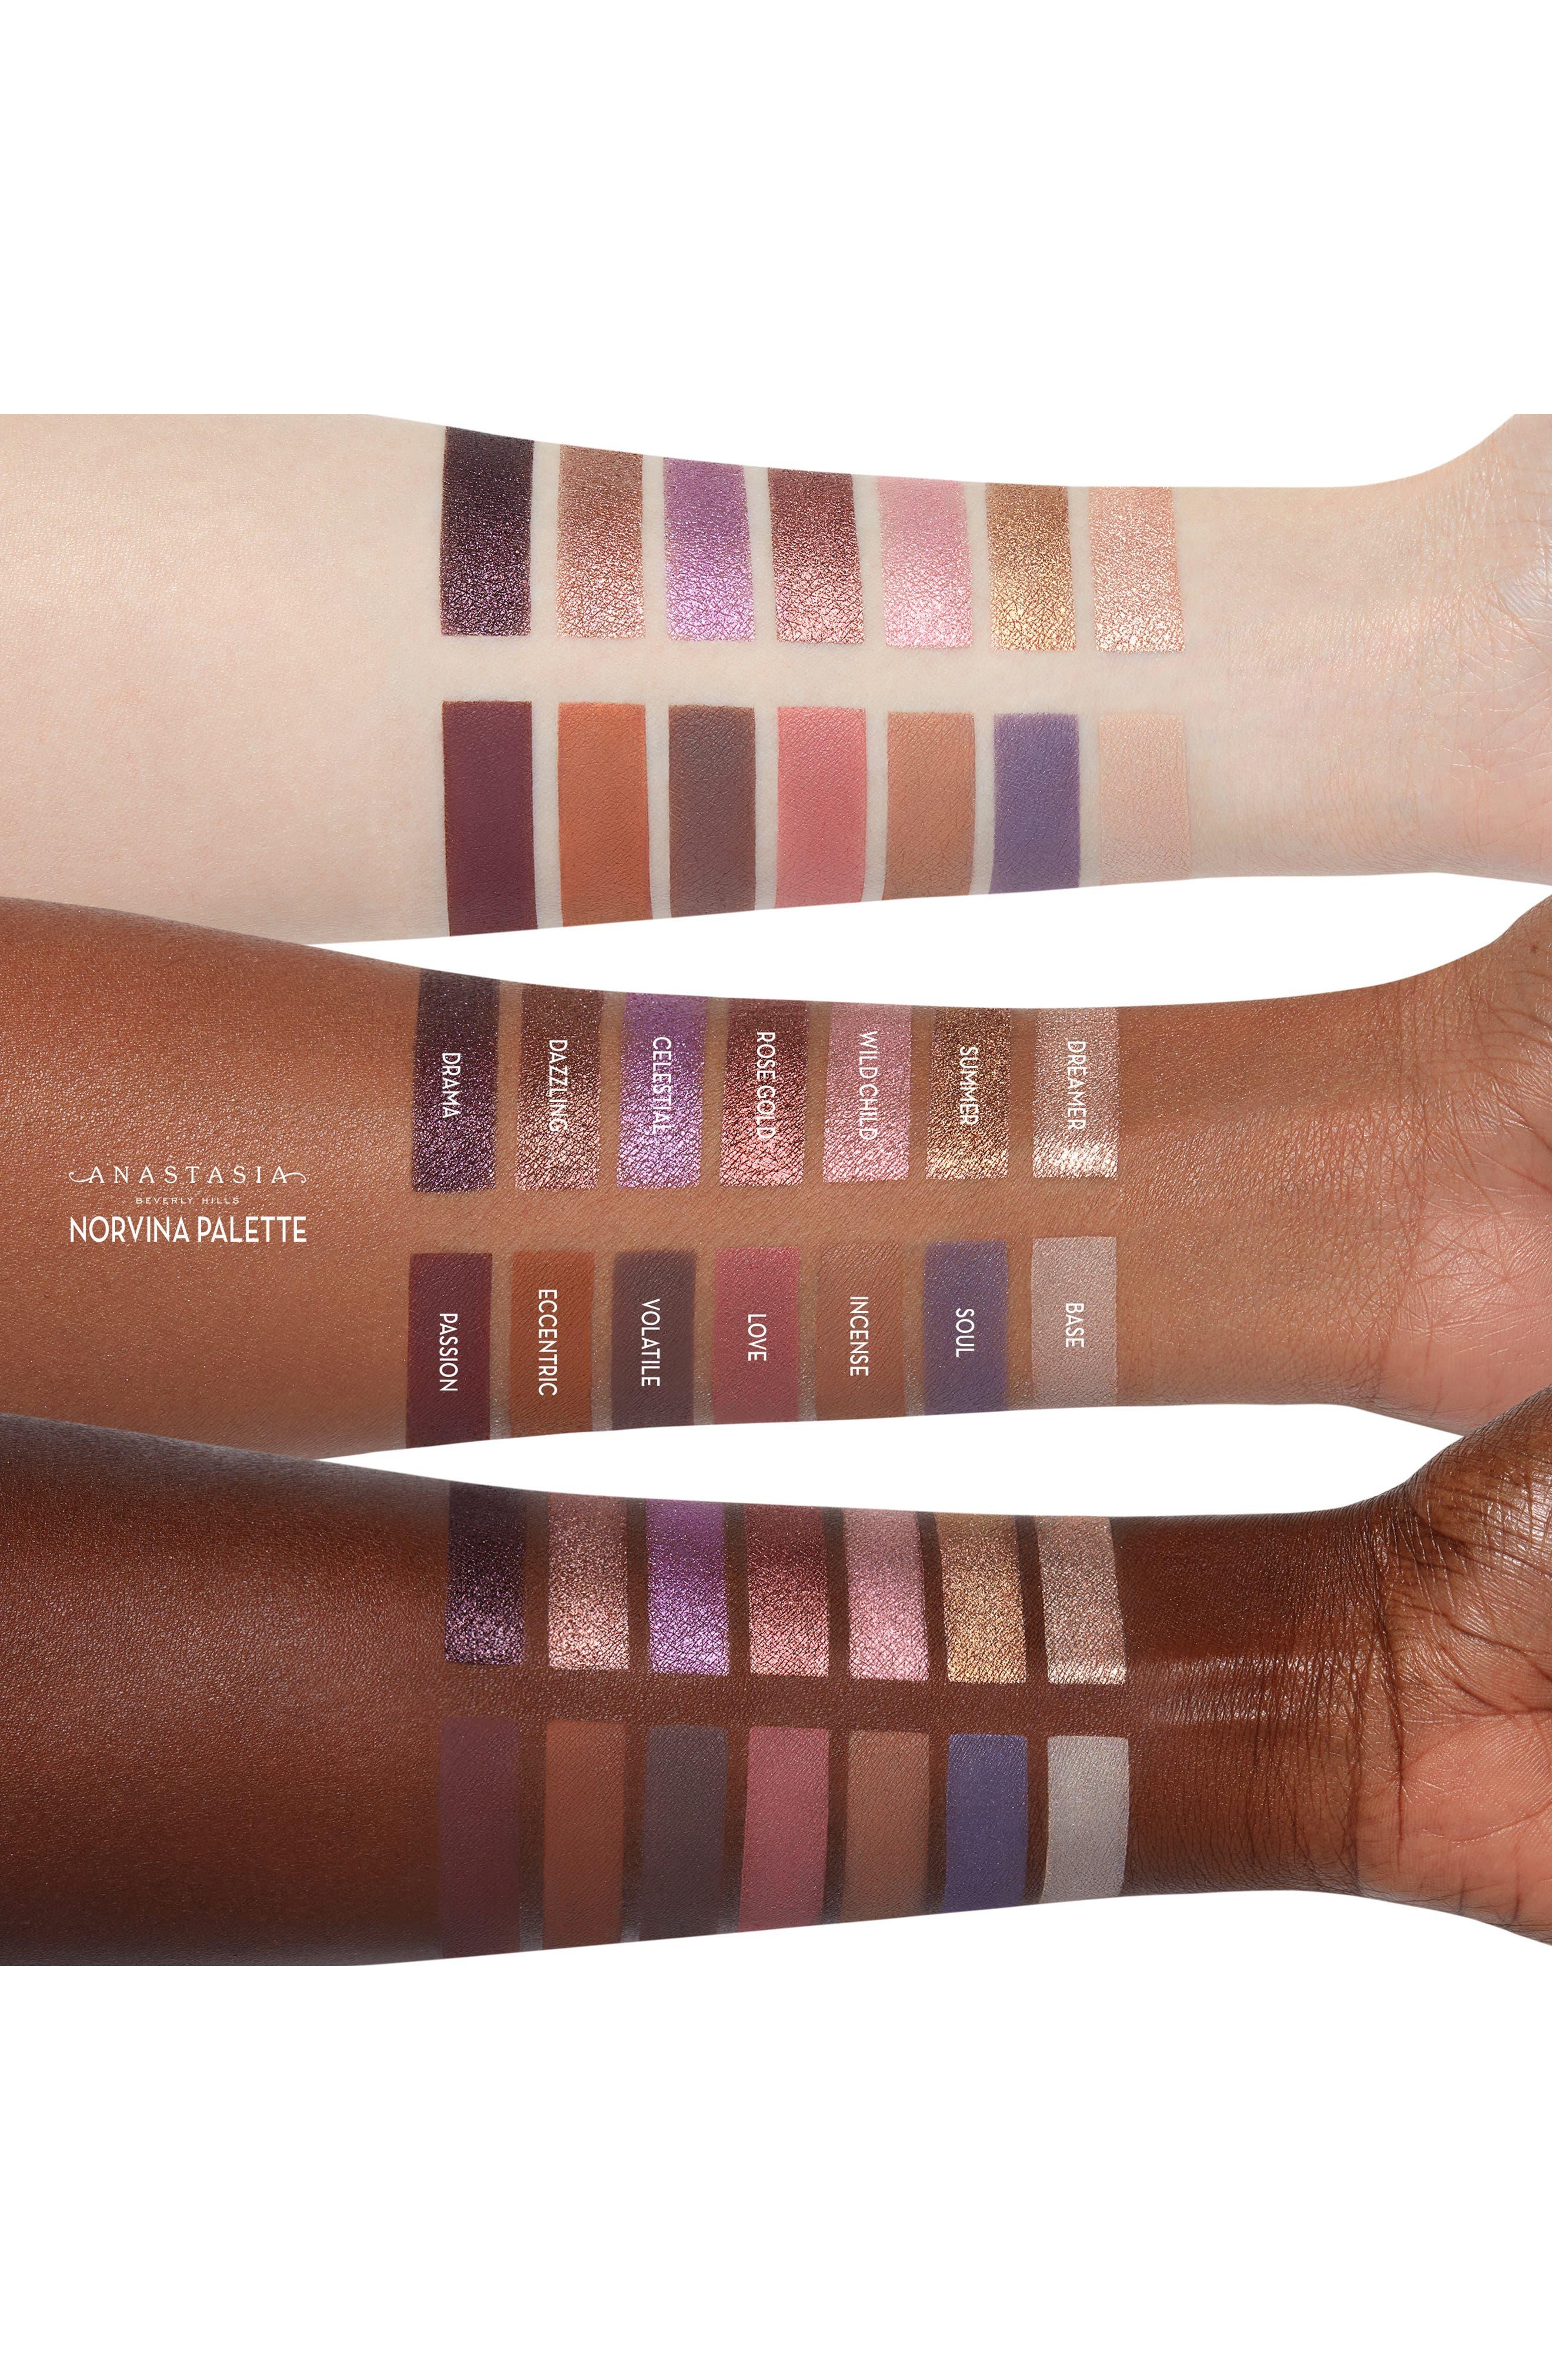 ANASTASIA BEVERLY HILLS, Norvina Eyeshadow Palette, Alternate thumbnail 2, color, NO COLOR